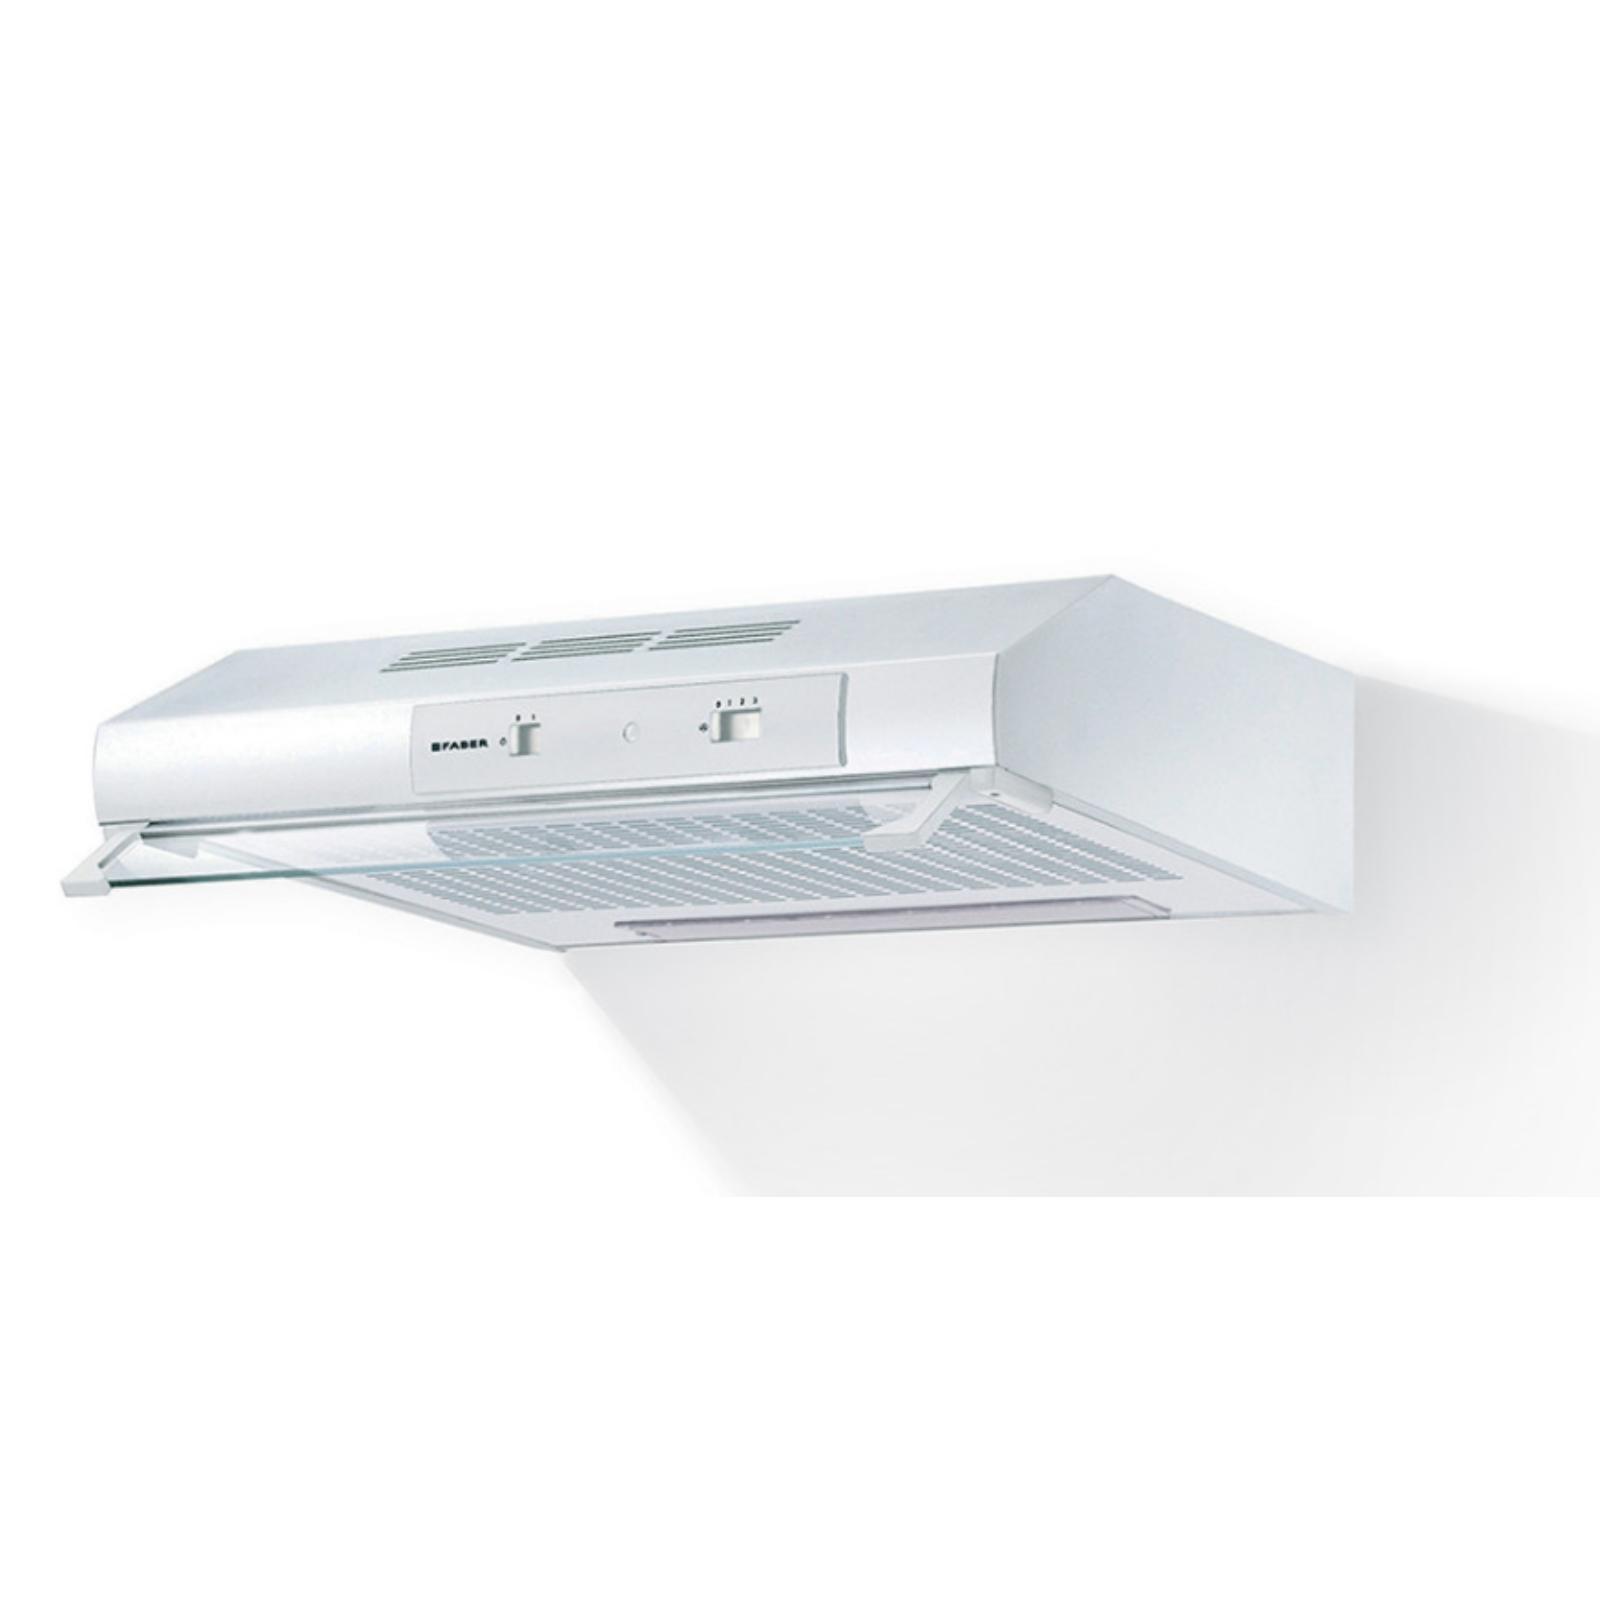 Hota traditionala Faber 741 BASE W A60 FB EXP, 60 cm, 235 m3h, 69 dB, filtru sintetic, Iluminare LED, control slide, 3 trepte, Alb